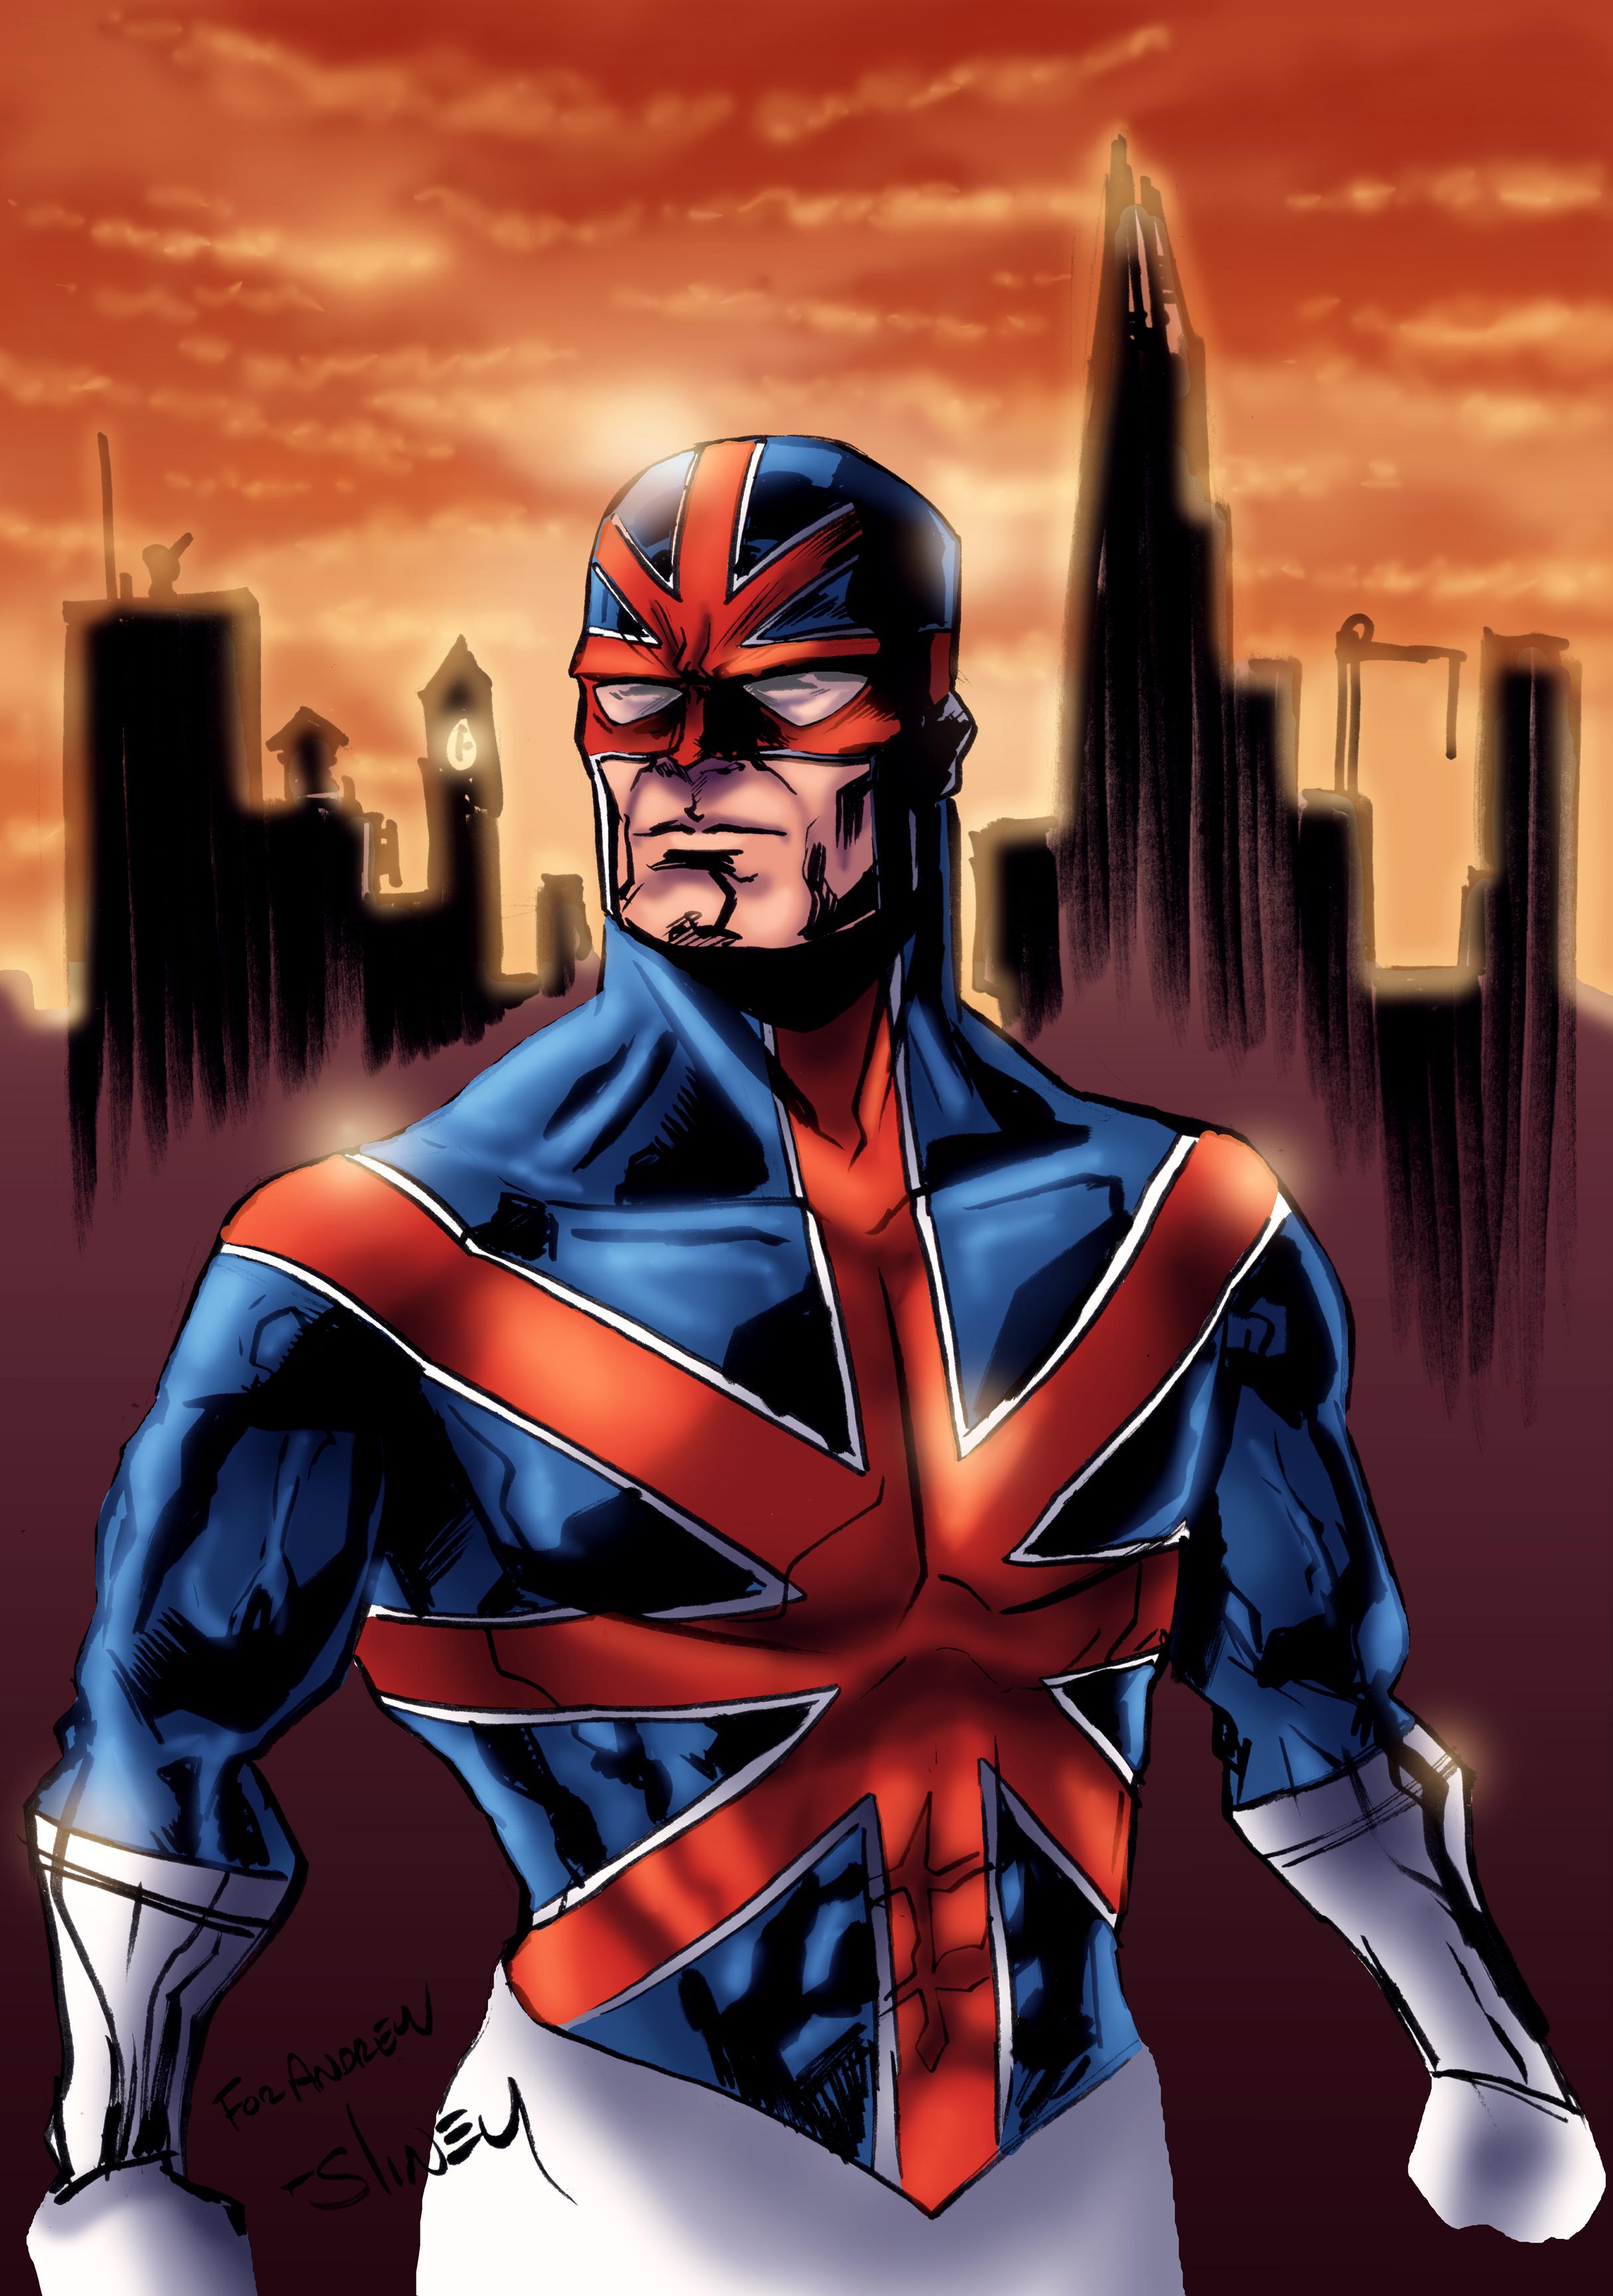 Best 51 Captain Britain Wallpaper on HipWallpaper Captain 2428x3456